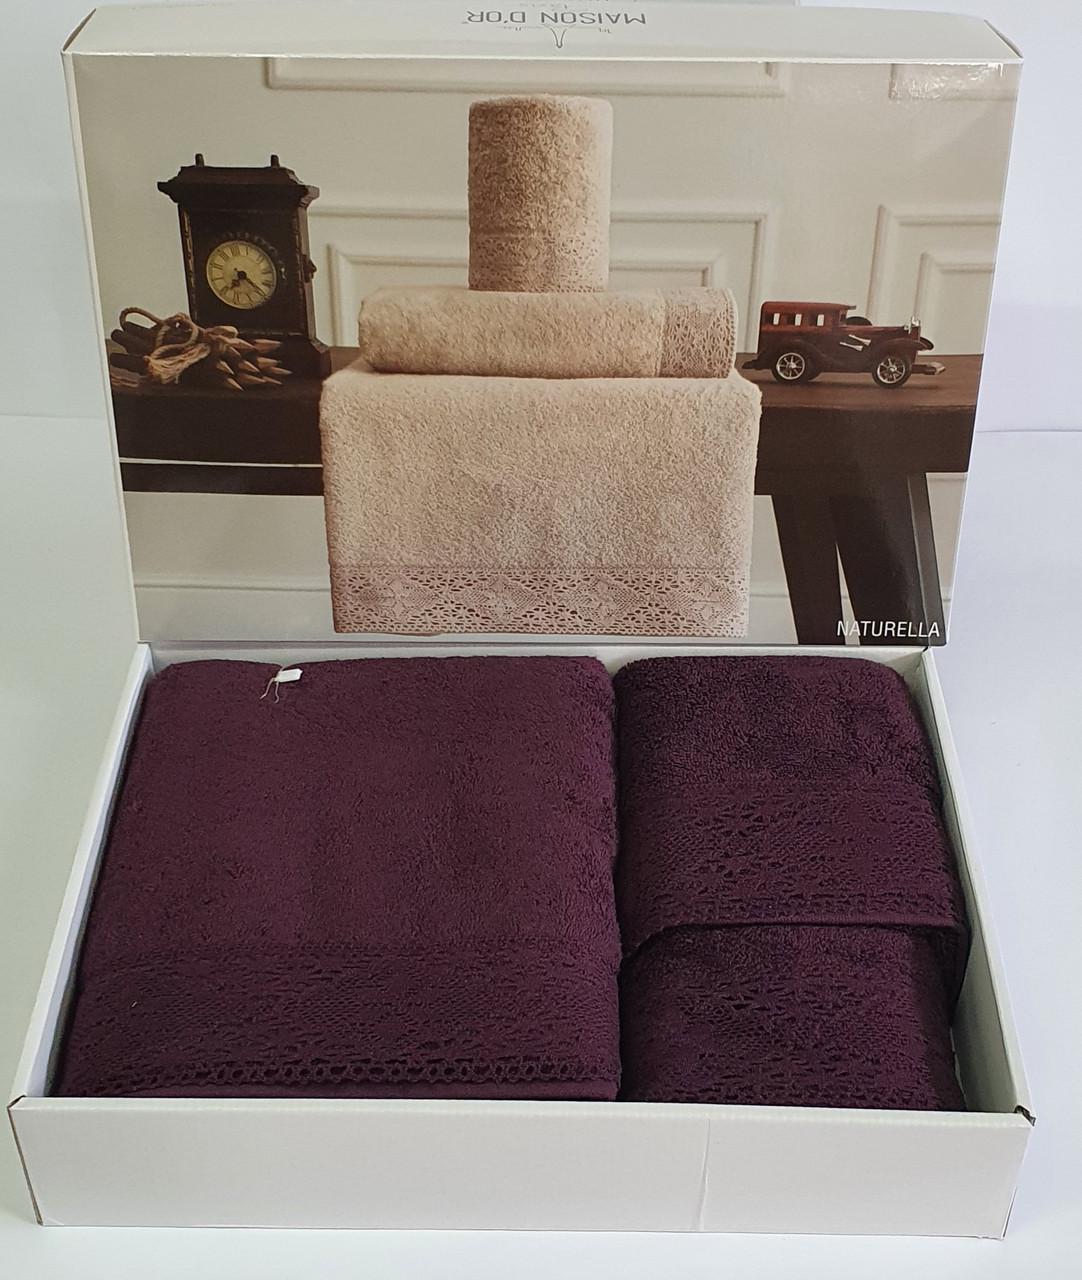 Рушники Maison d'or 3шт Naturella Purple